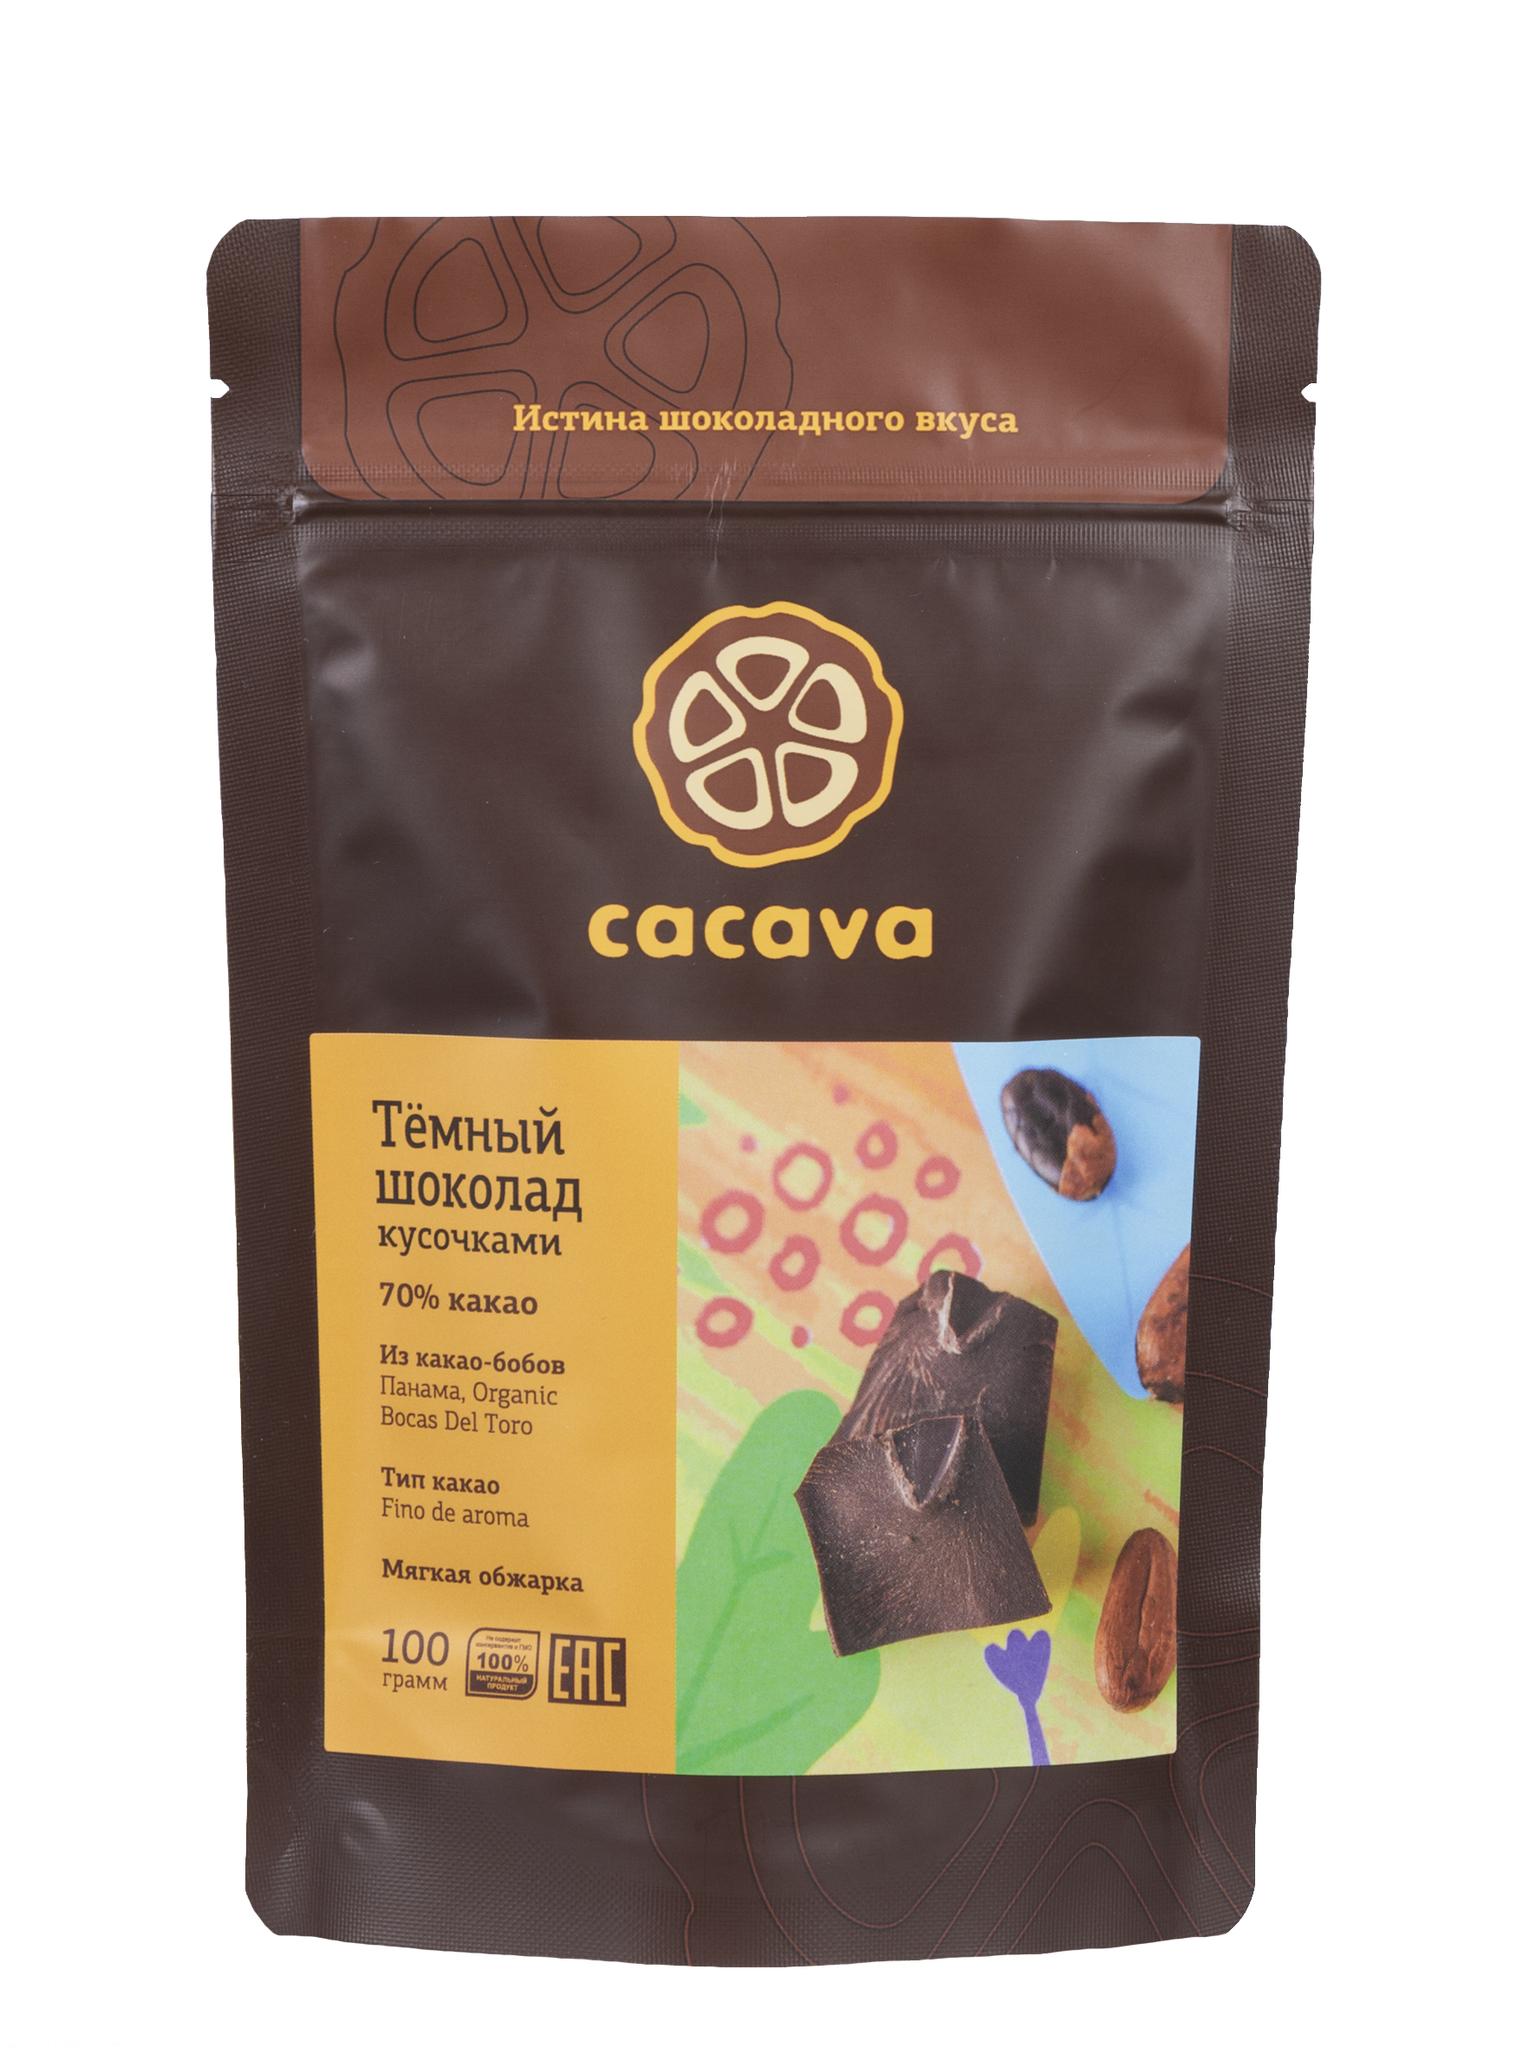 Тёмный шоколад 70 % какао (Панама), упаковка 100 грамм